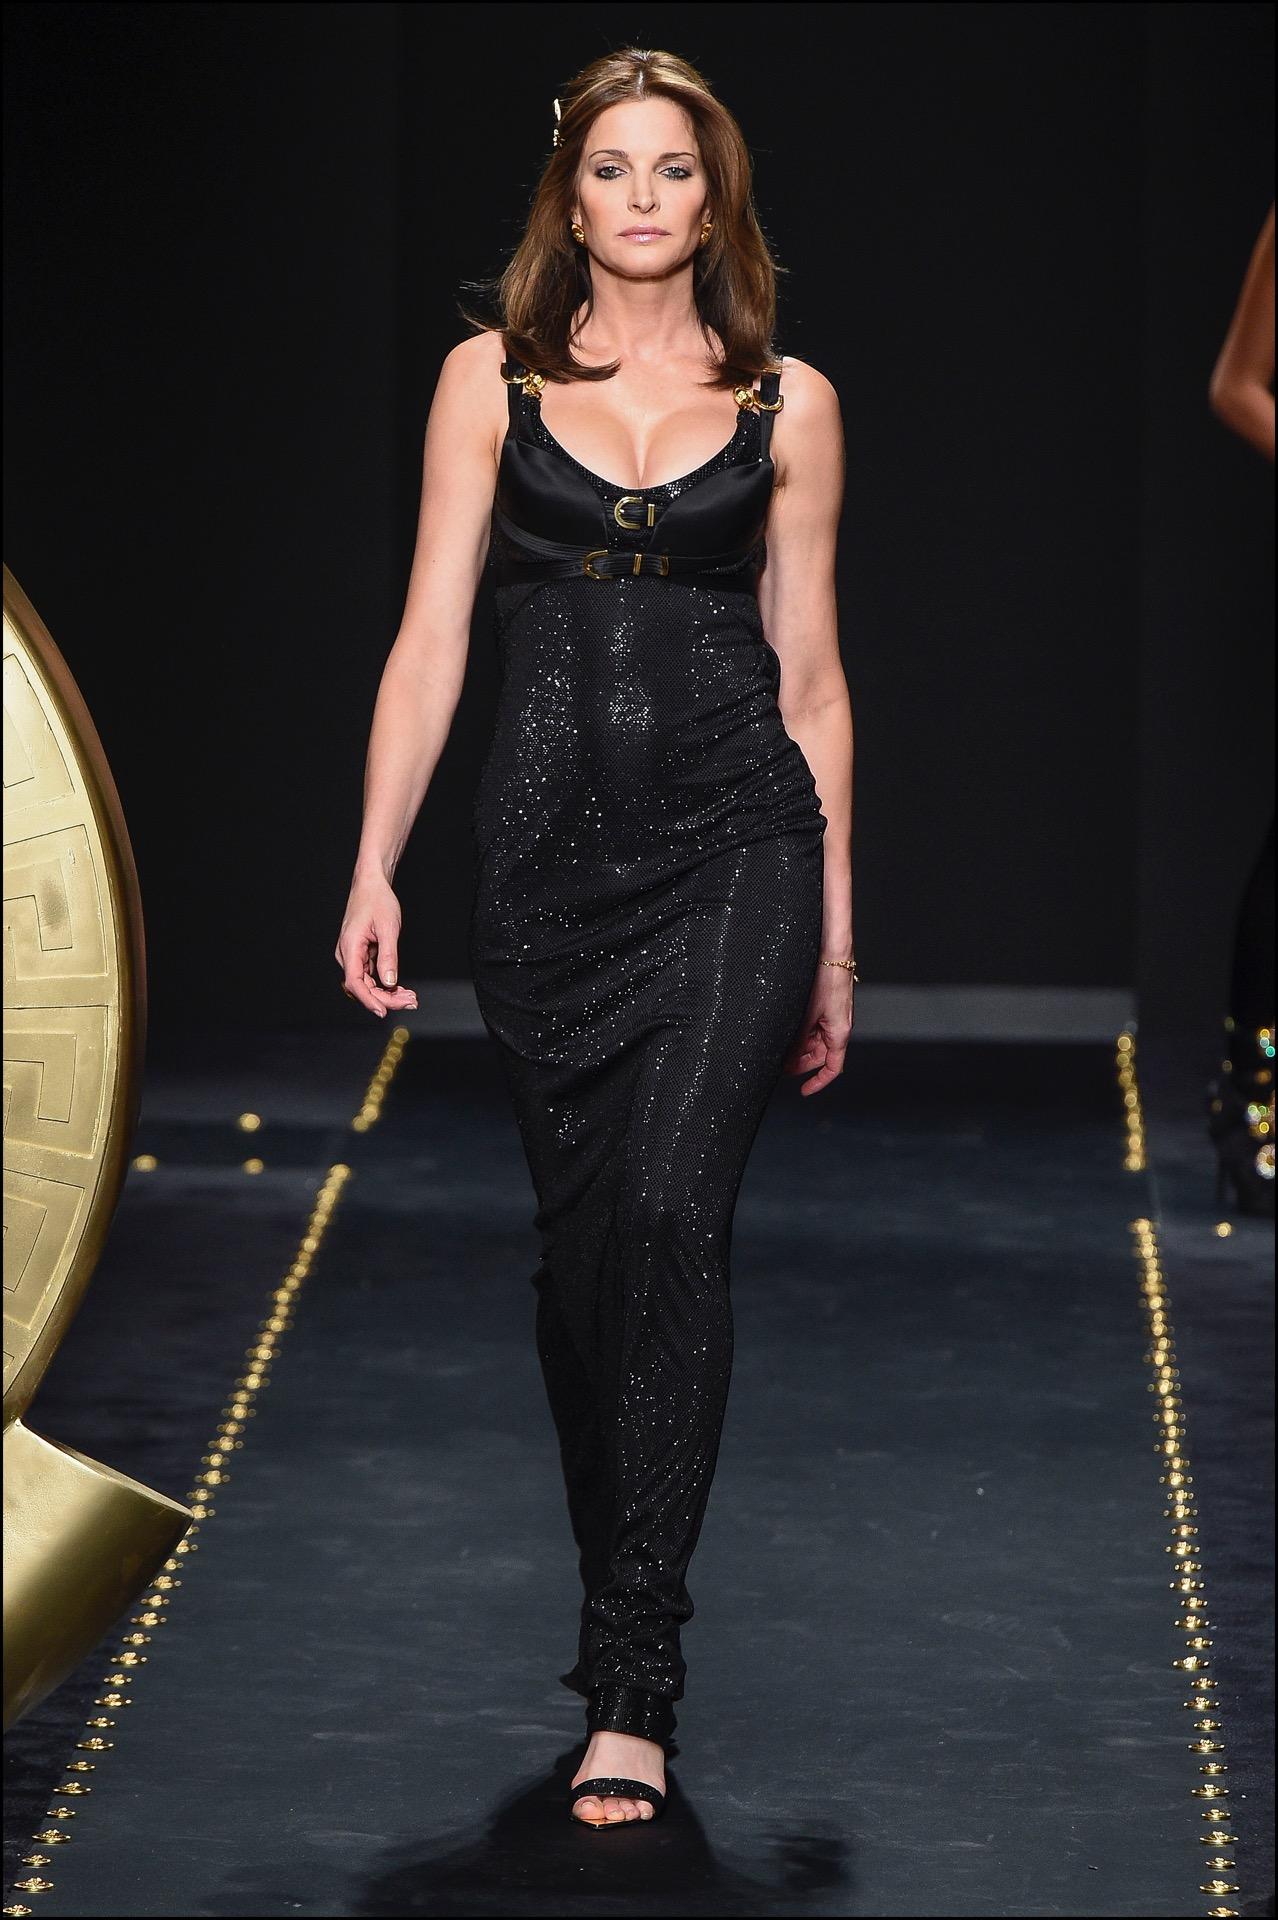 La ex modelo Stephanie Seymour cerró el desfile.